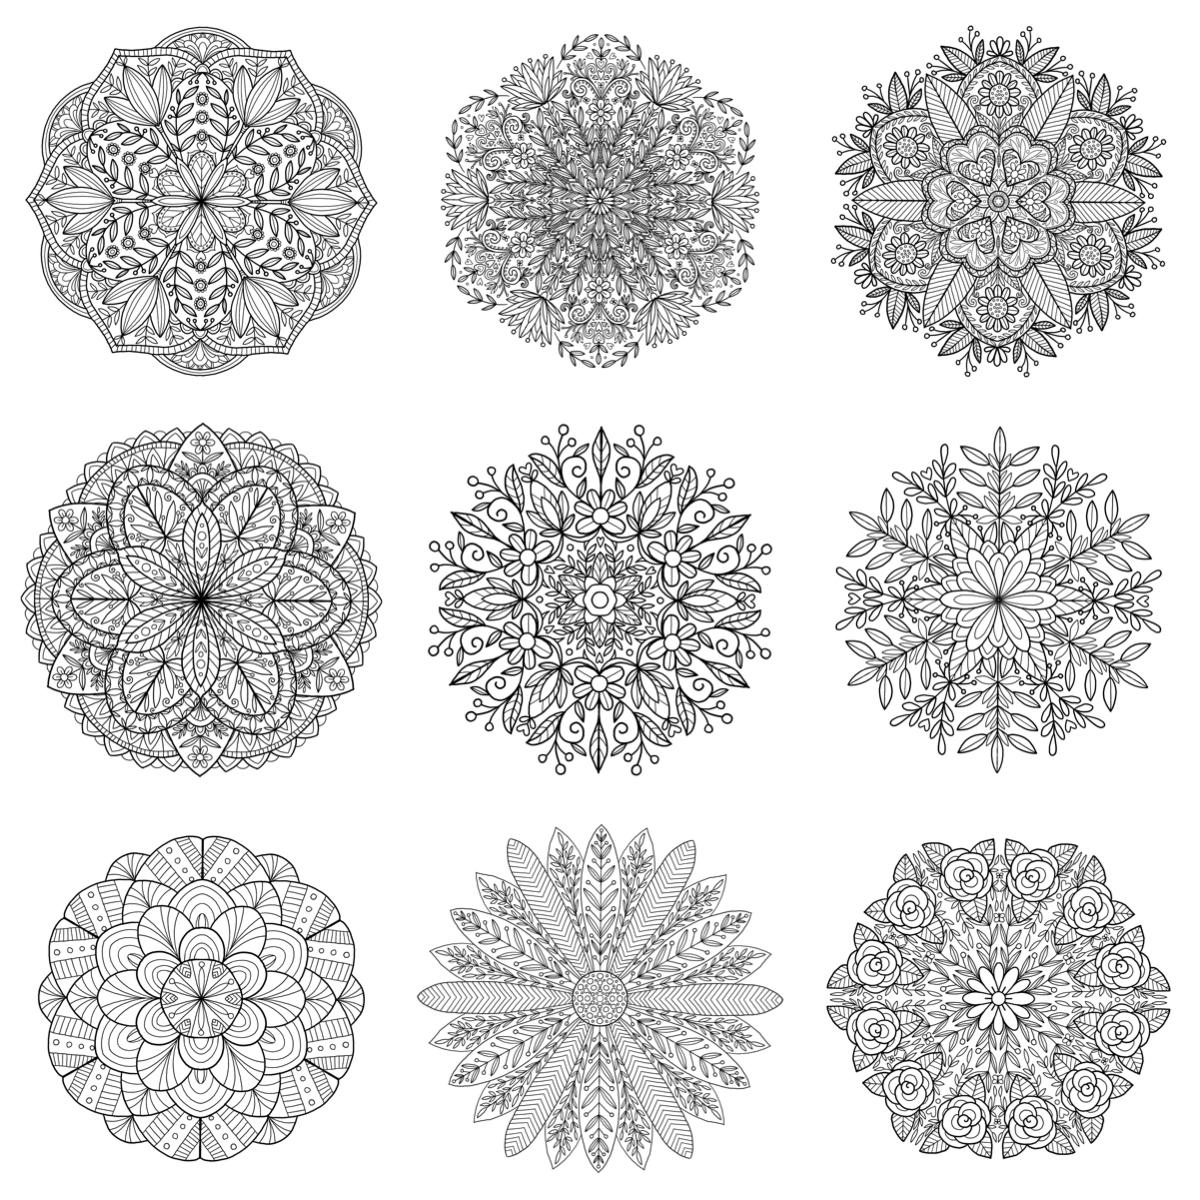 NSTURK_FloralMandalas_collage1.jpg